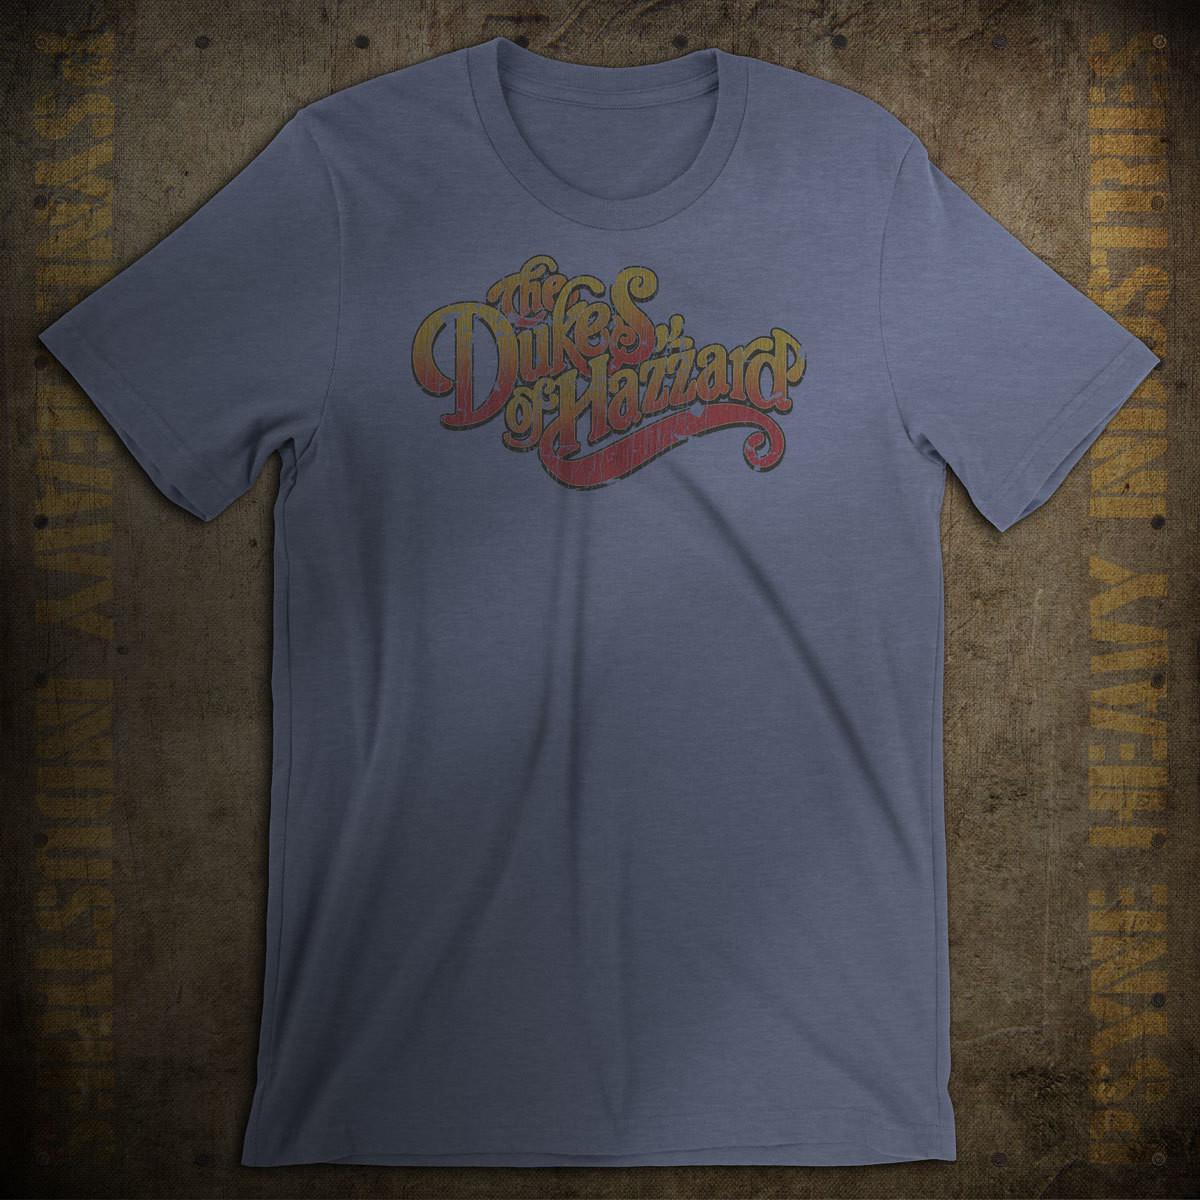 Dukes of Hazzard Script Vintage T-Shirt